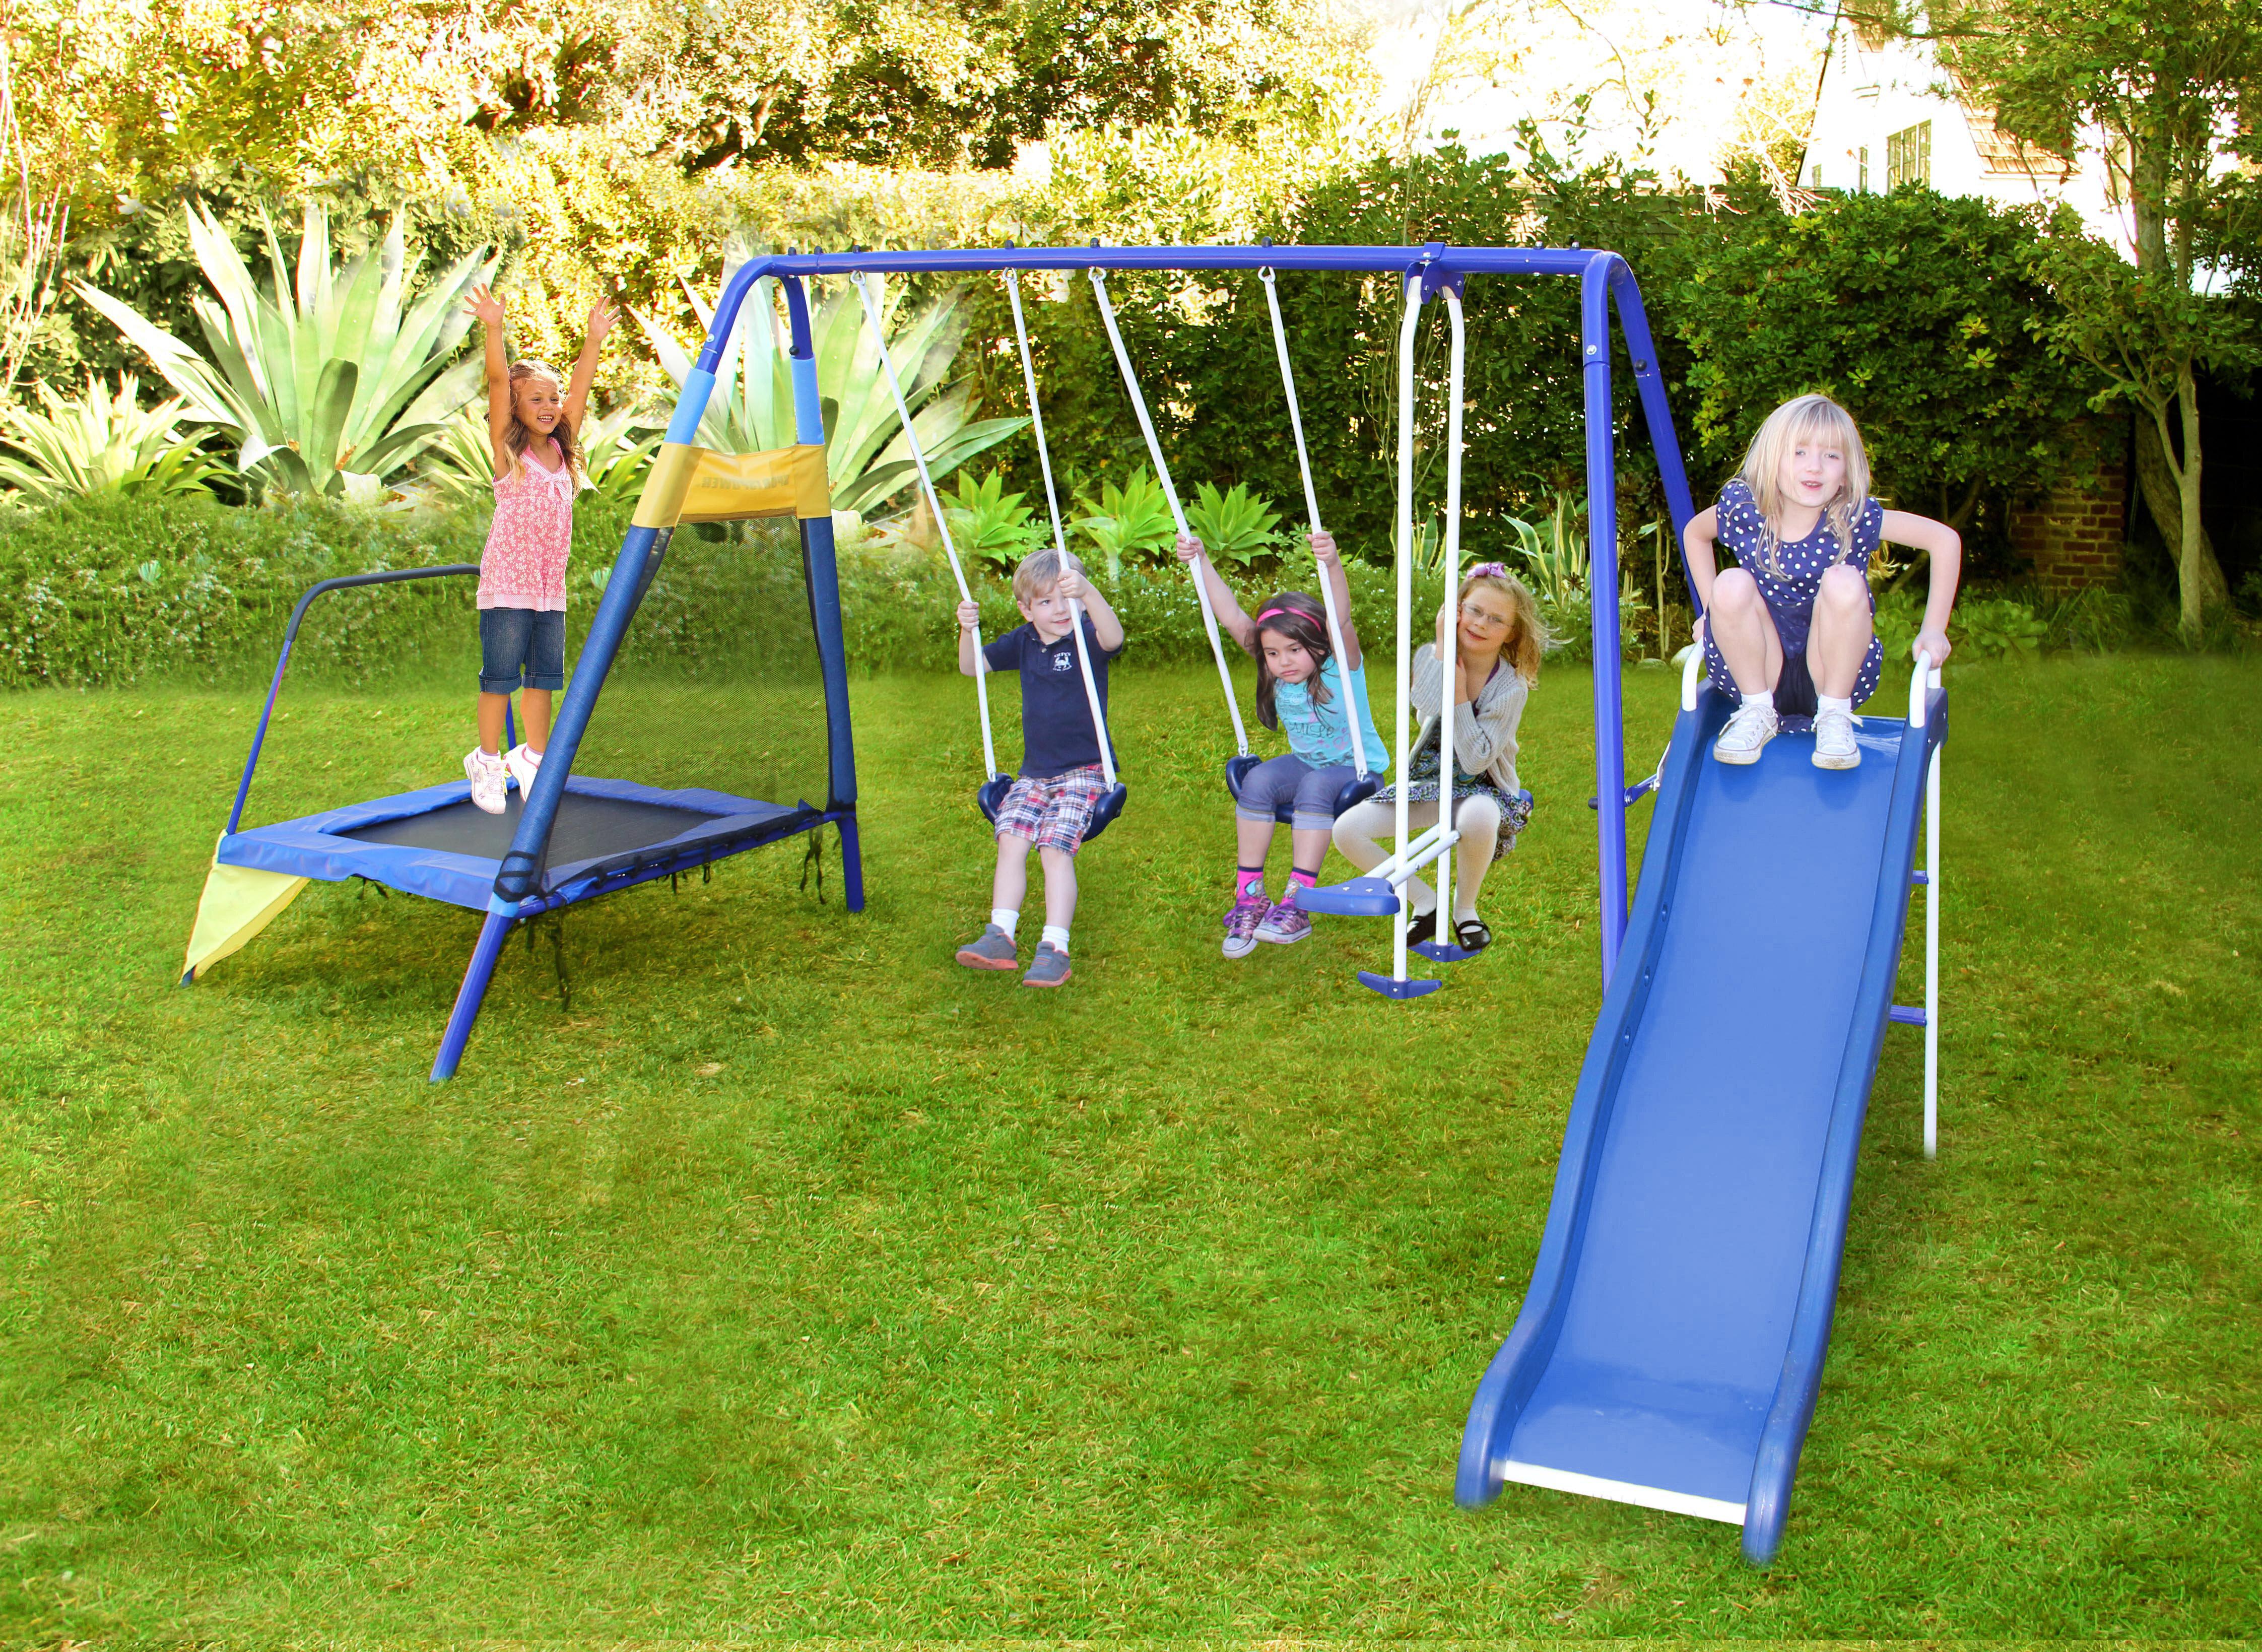 Natus Inc Almansor Trampoline Slide And Swing Set Reviews Wayfair